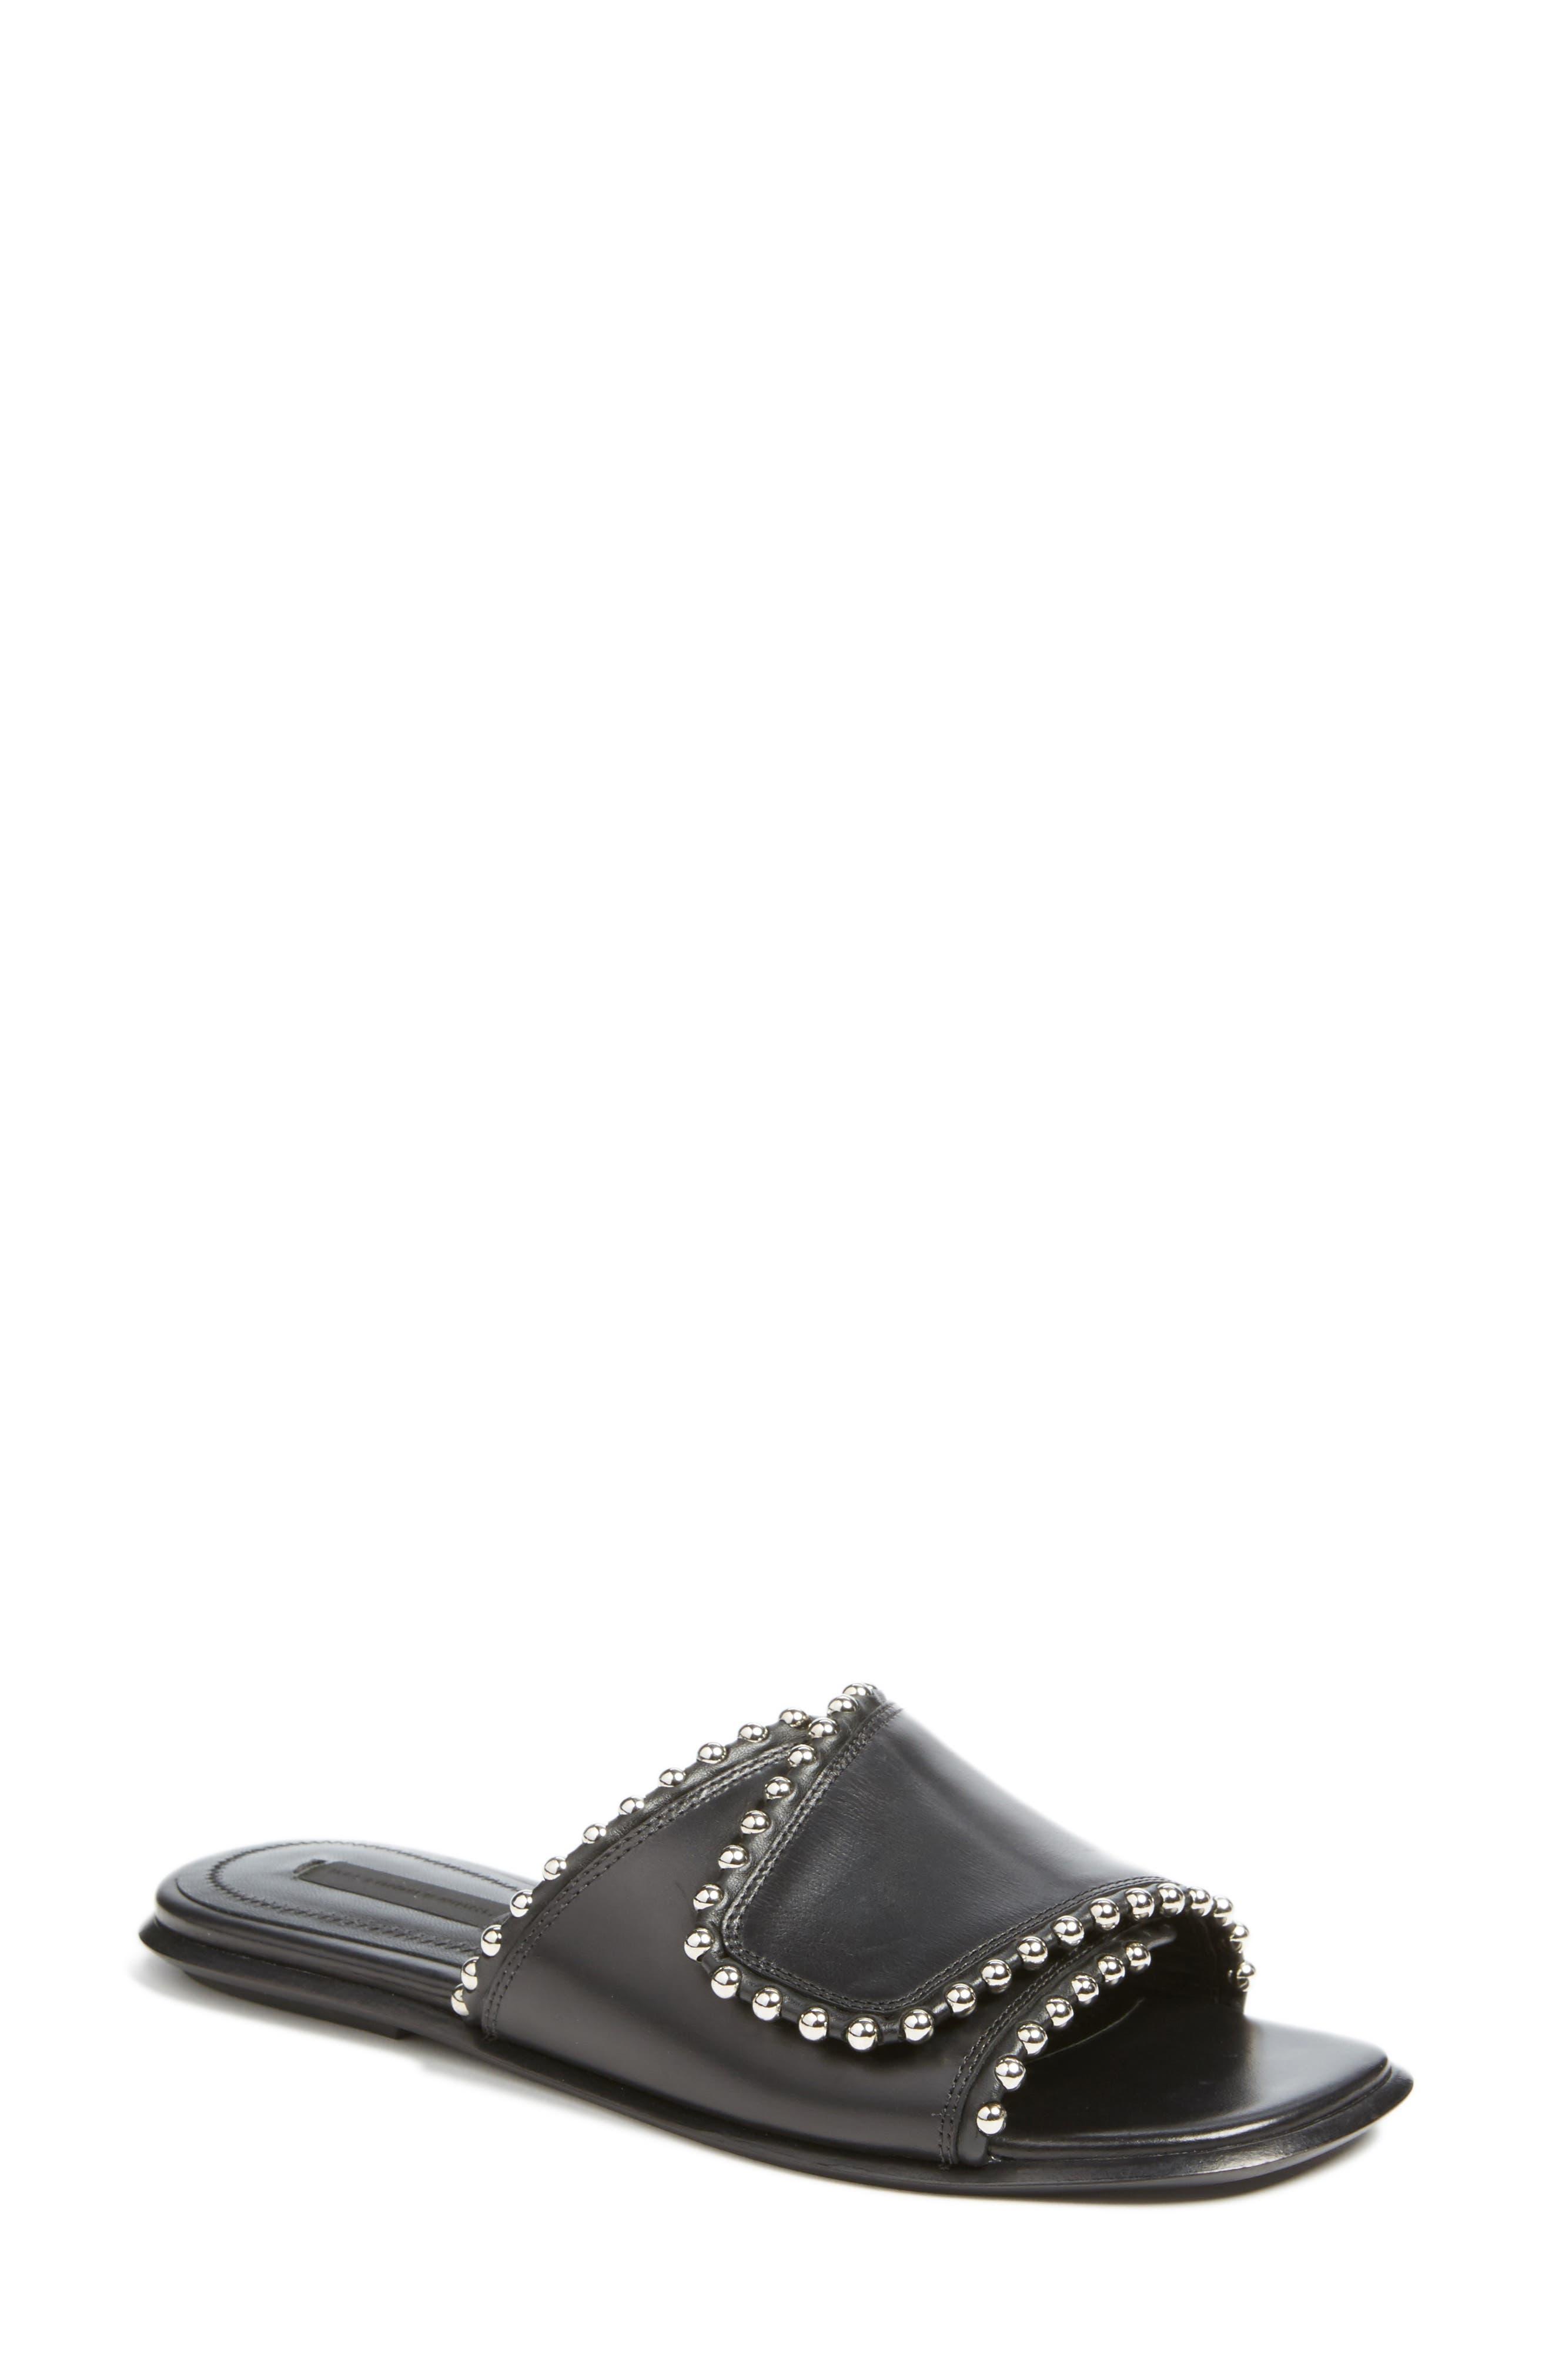 ALEXANDER WANG Leidy Slide Sandal, Main, color, 001